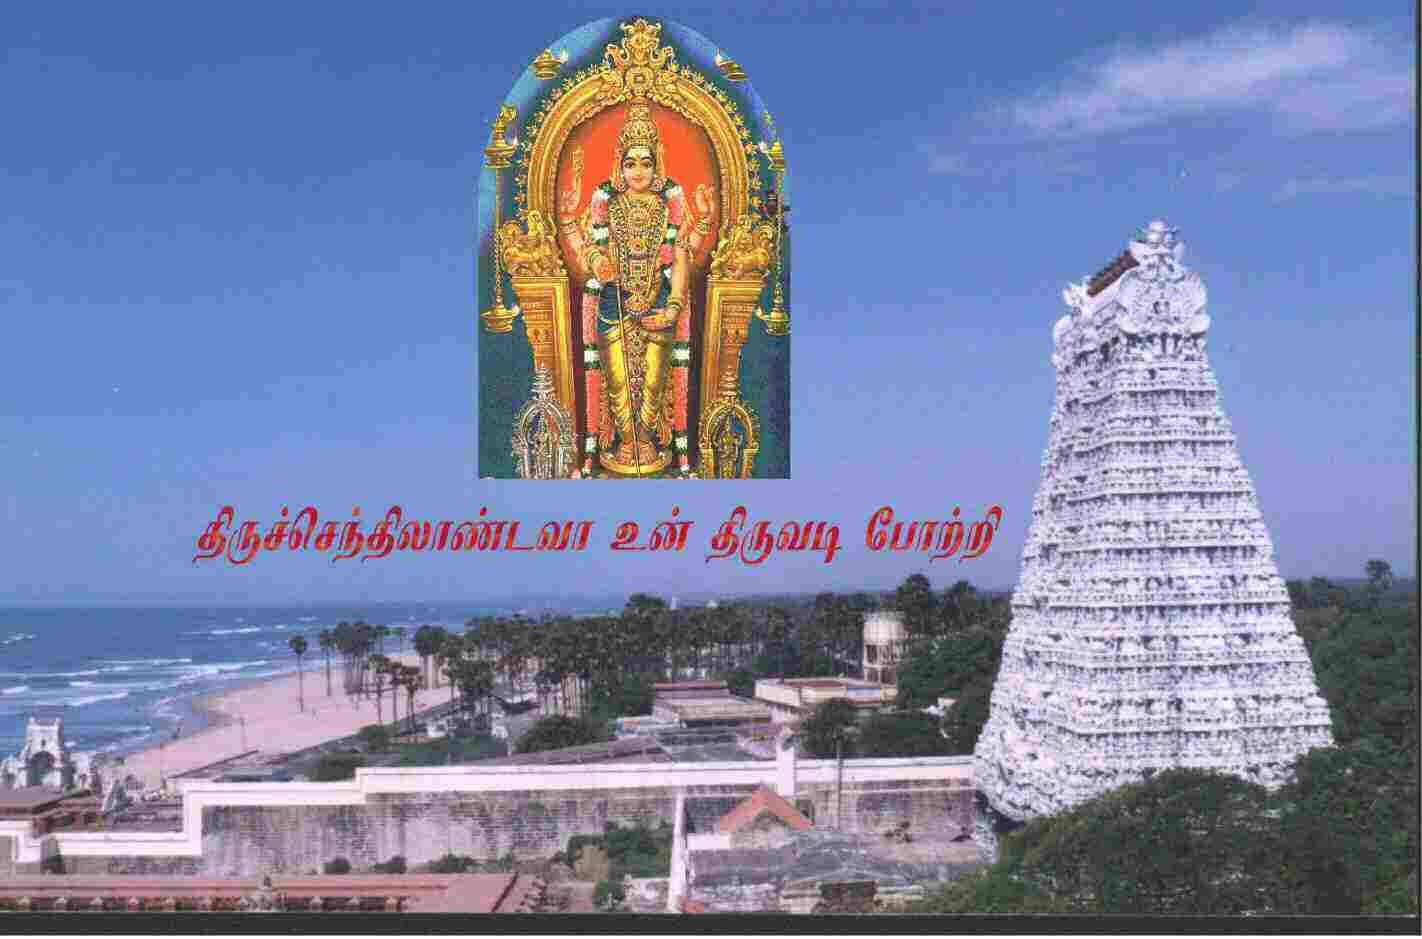 Tiruchendur Sendil Andavar Murugan Temple